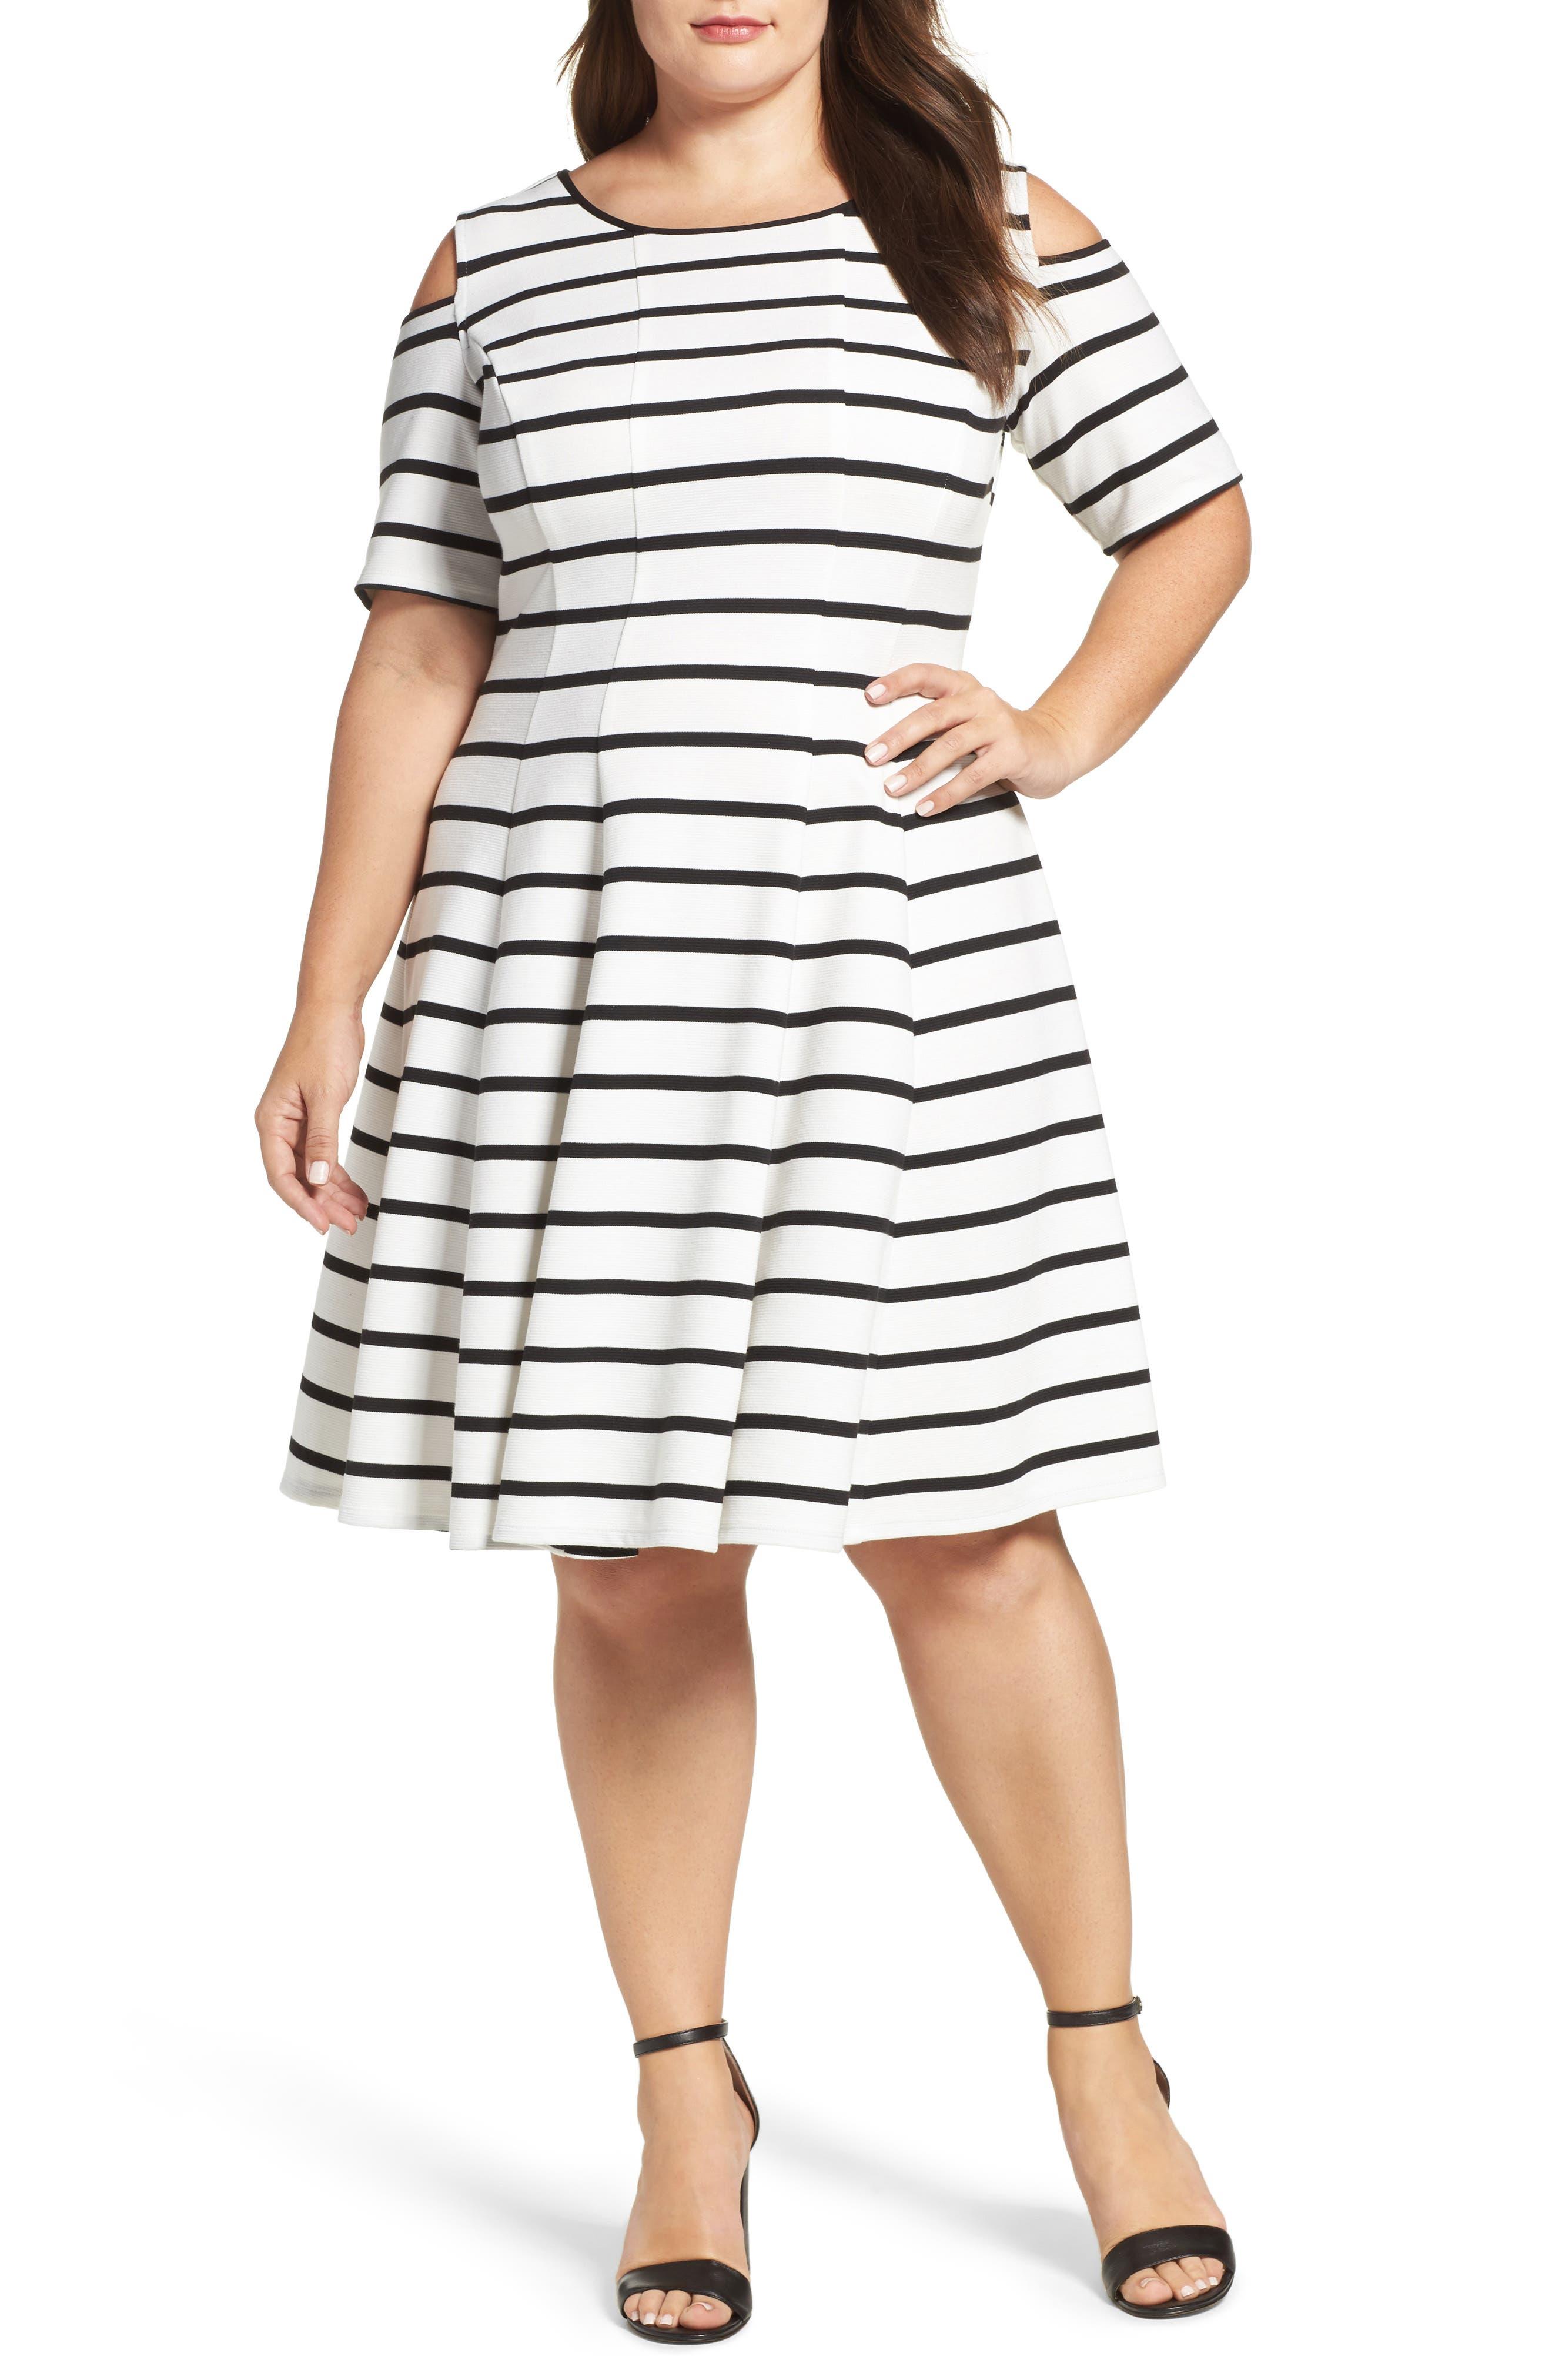 Alternate Image 1 Selected - Gabby Skye Cold Shoulder Fit & Flare Dress (Plus Size)